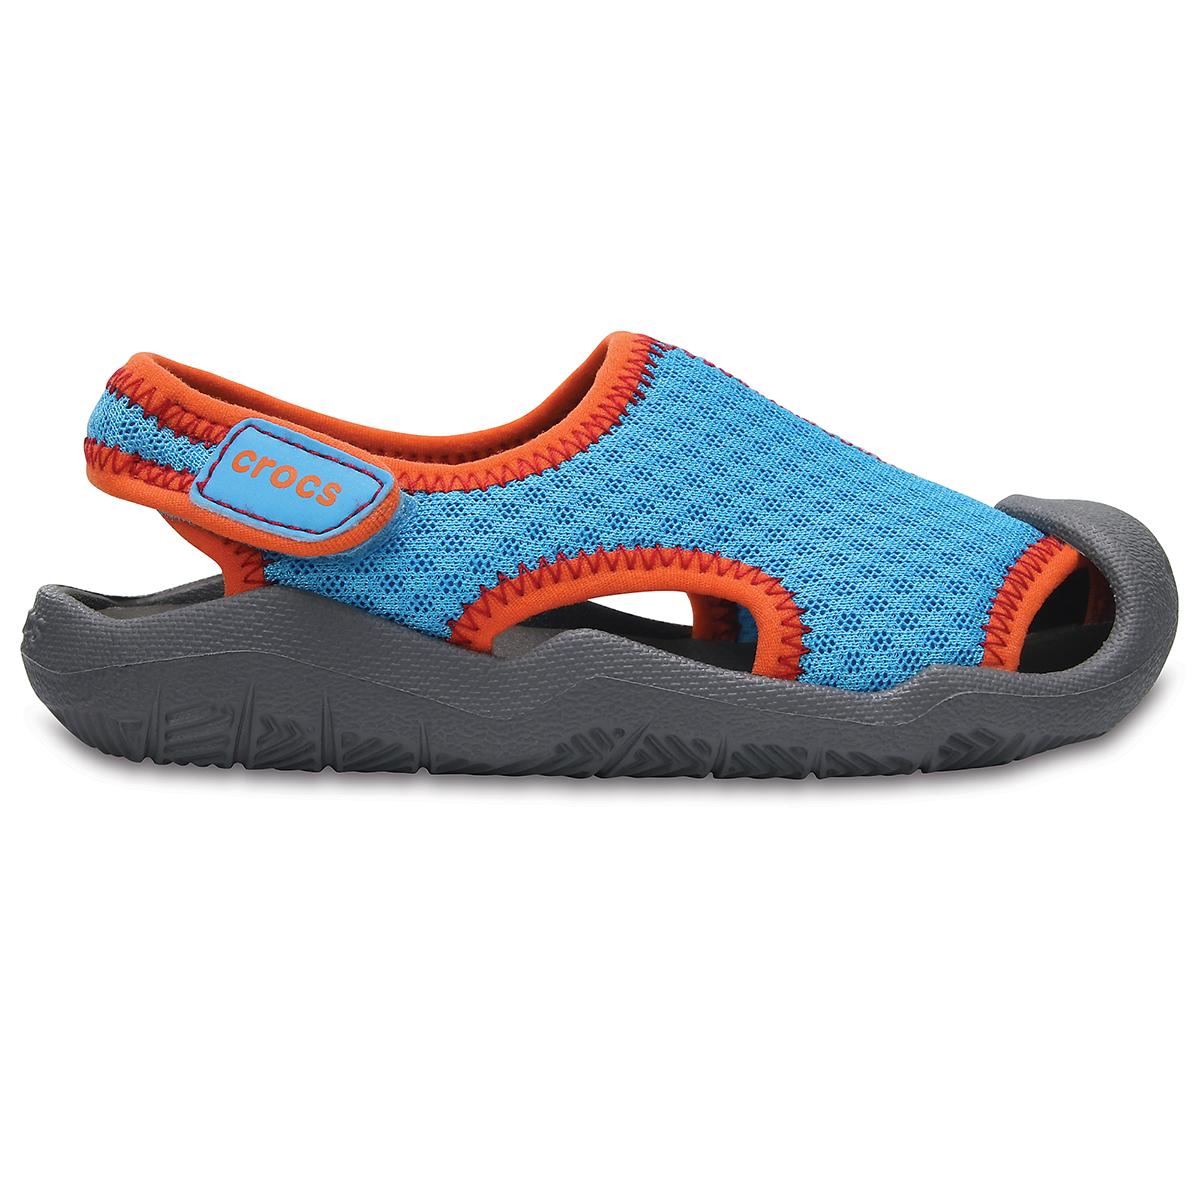 Crocs Swiftwater Sandal K - Gök Mavisi/Duman